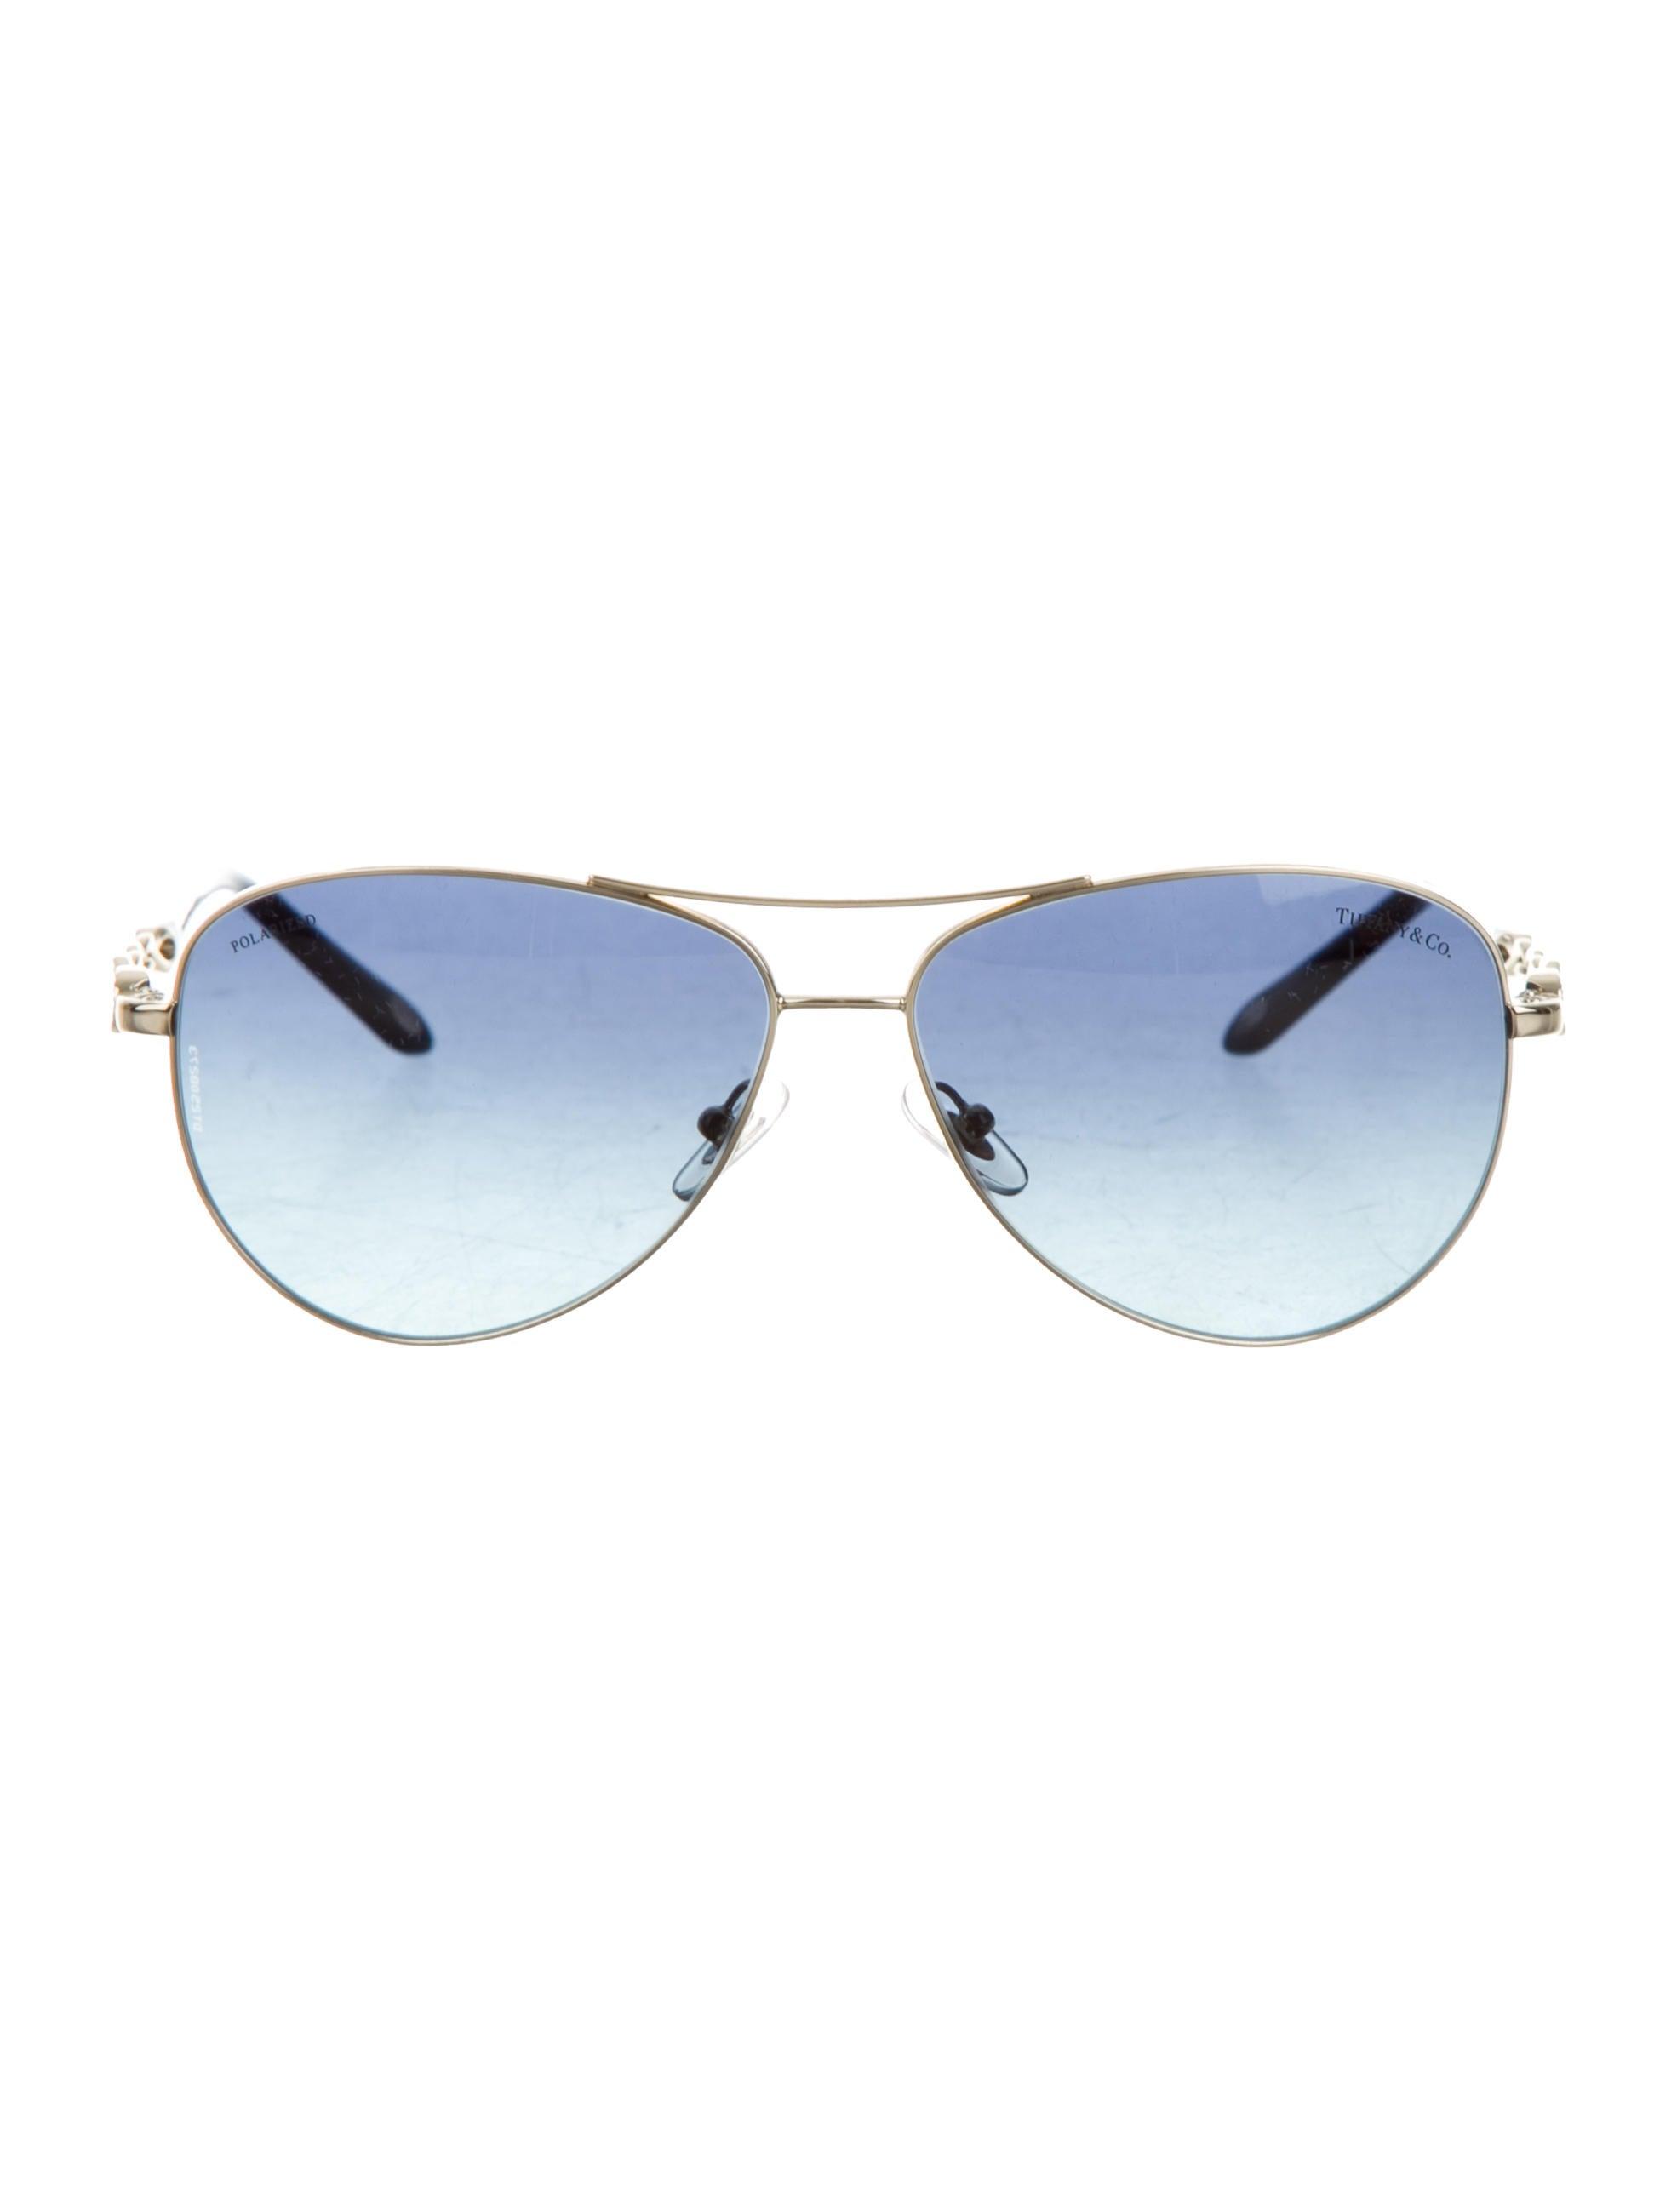 adcacfe26117 Tiffany Aviator Sunglasses For Women - Bitterroot Public Library